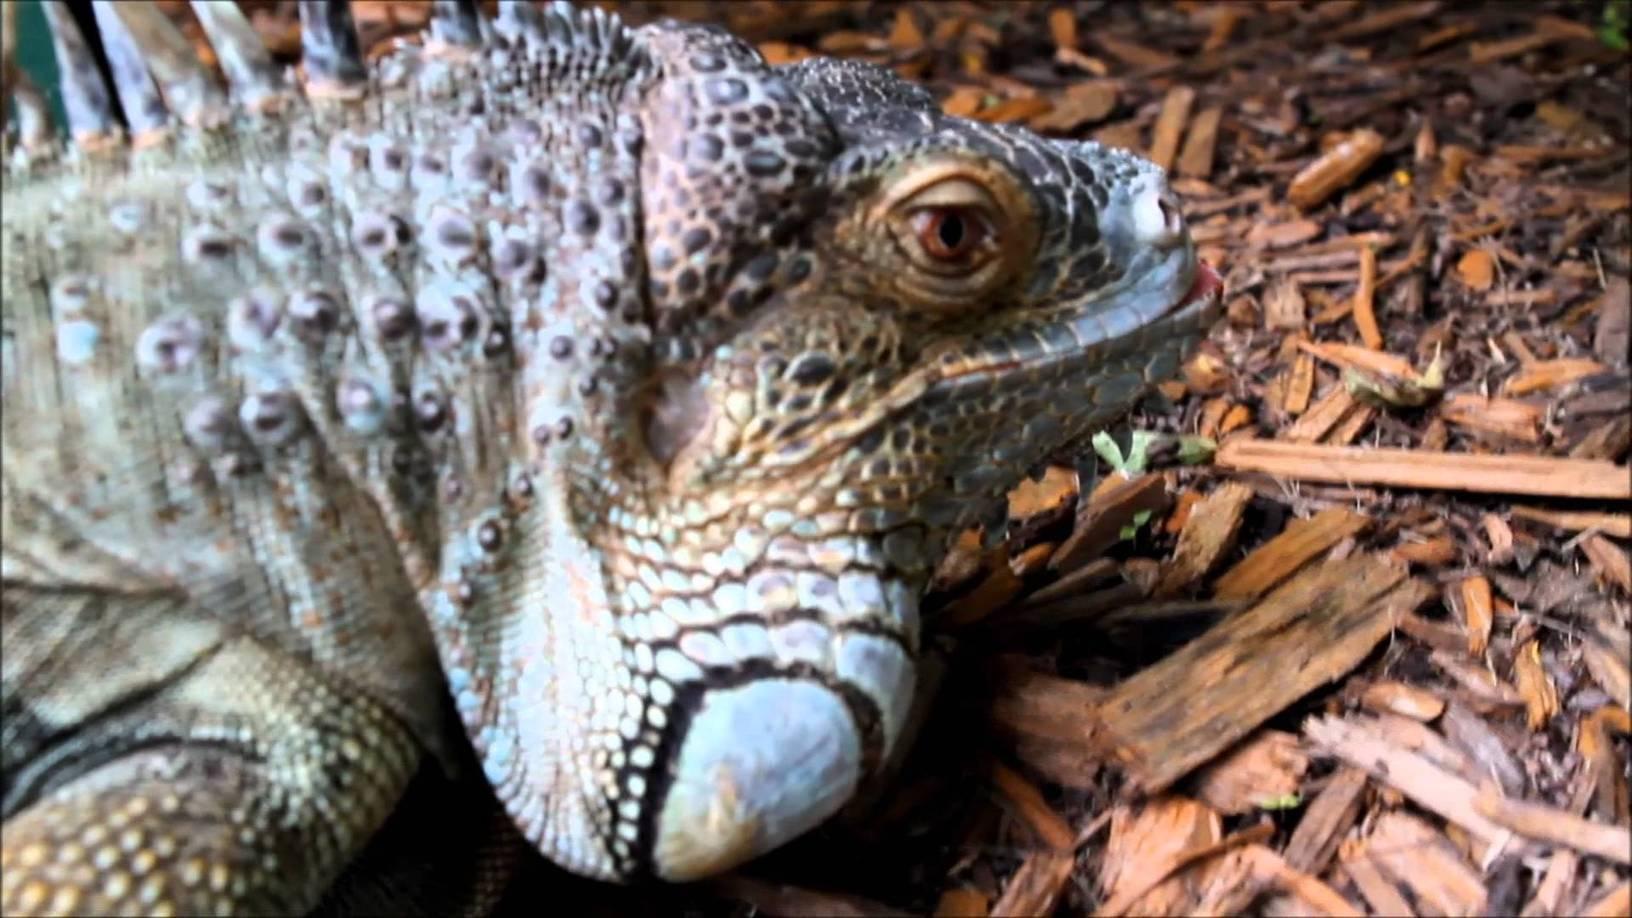 Invasive species in the everglades parque nac for Invasive fish in florida